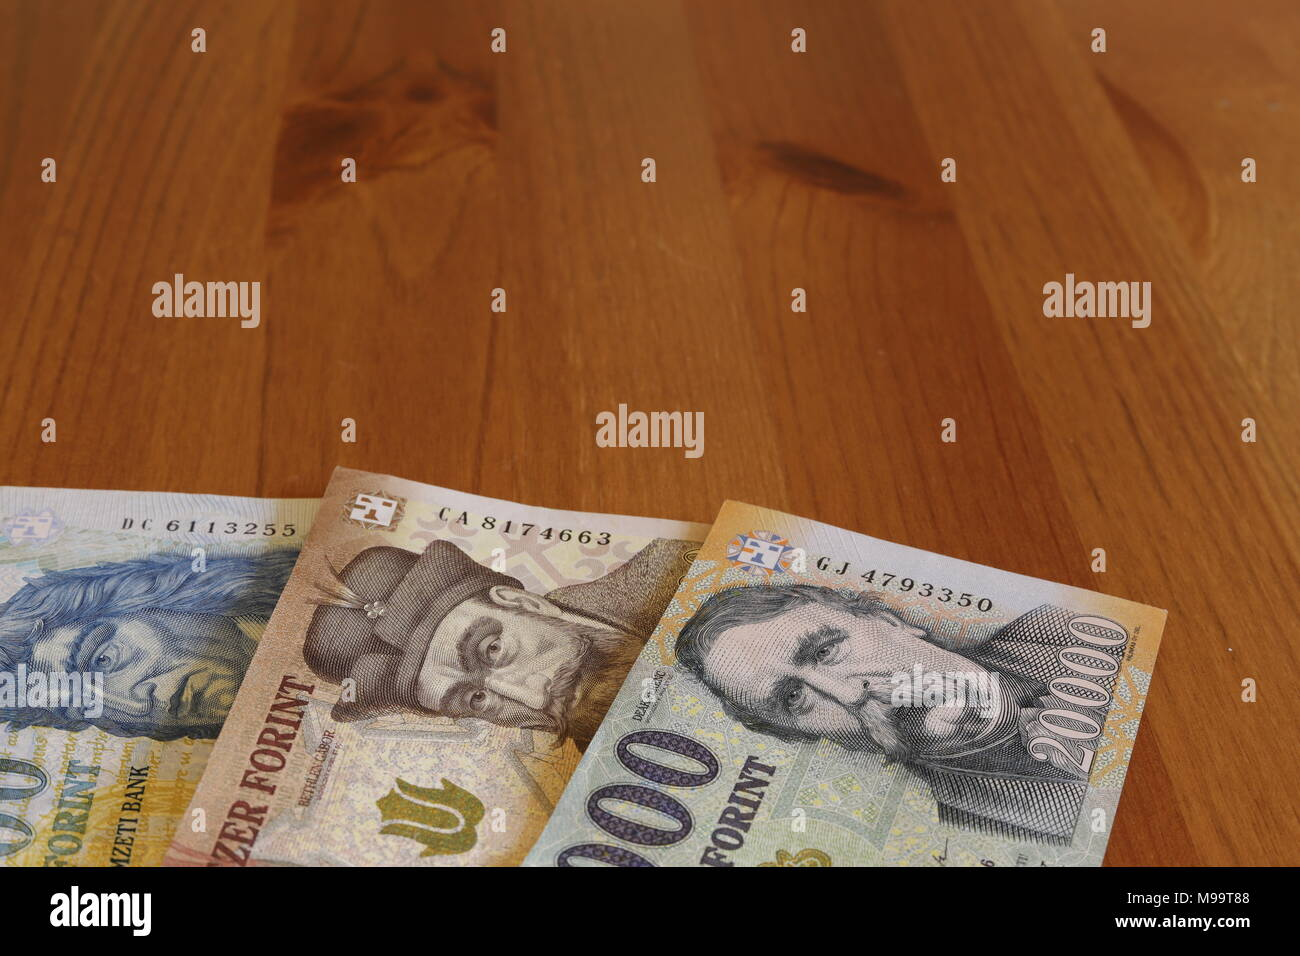 Travel Notes Stockfotos & Travel Notes Bilder - Seite 3 - Alamy